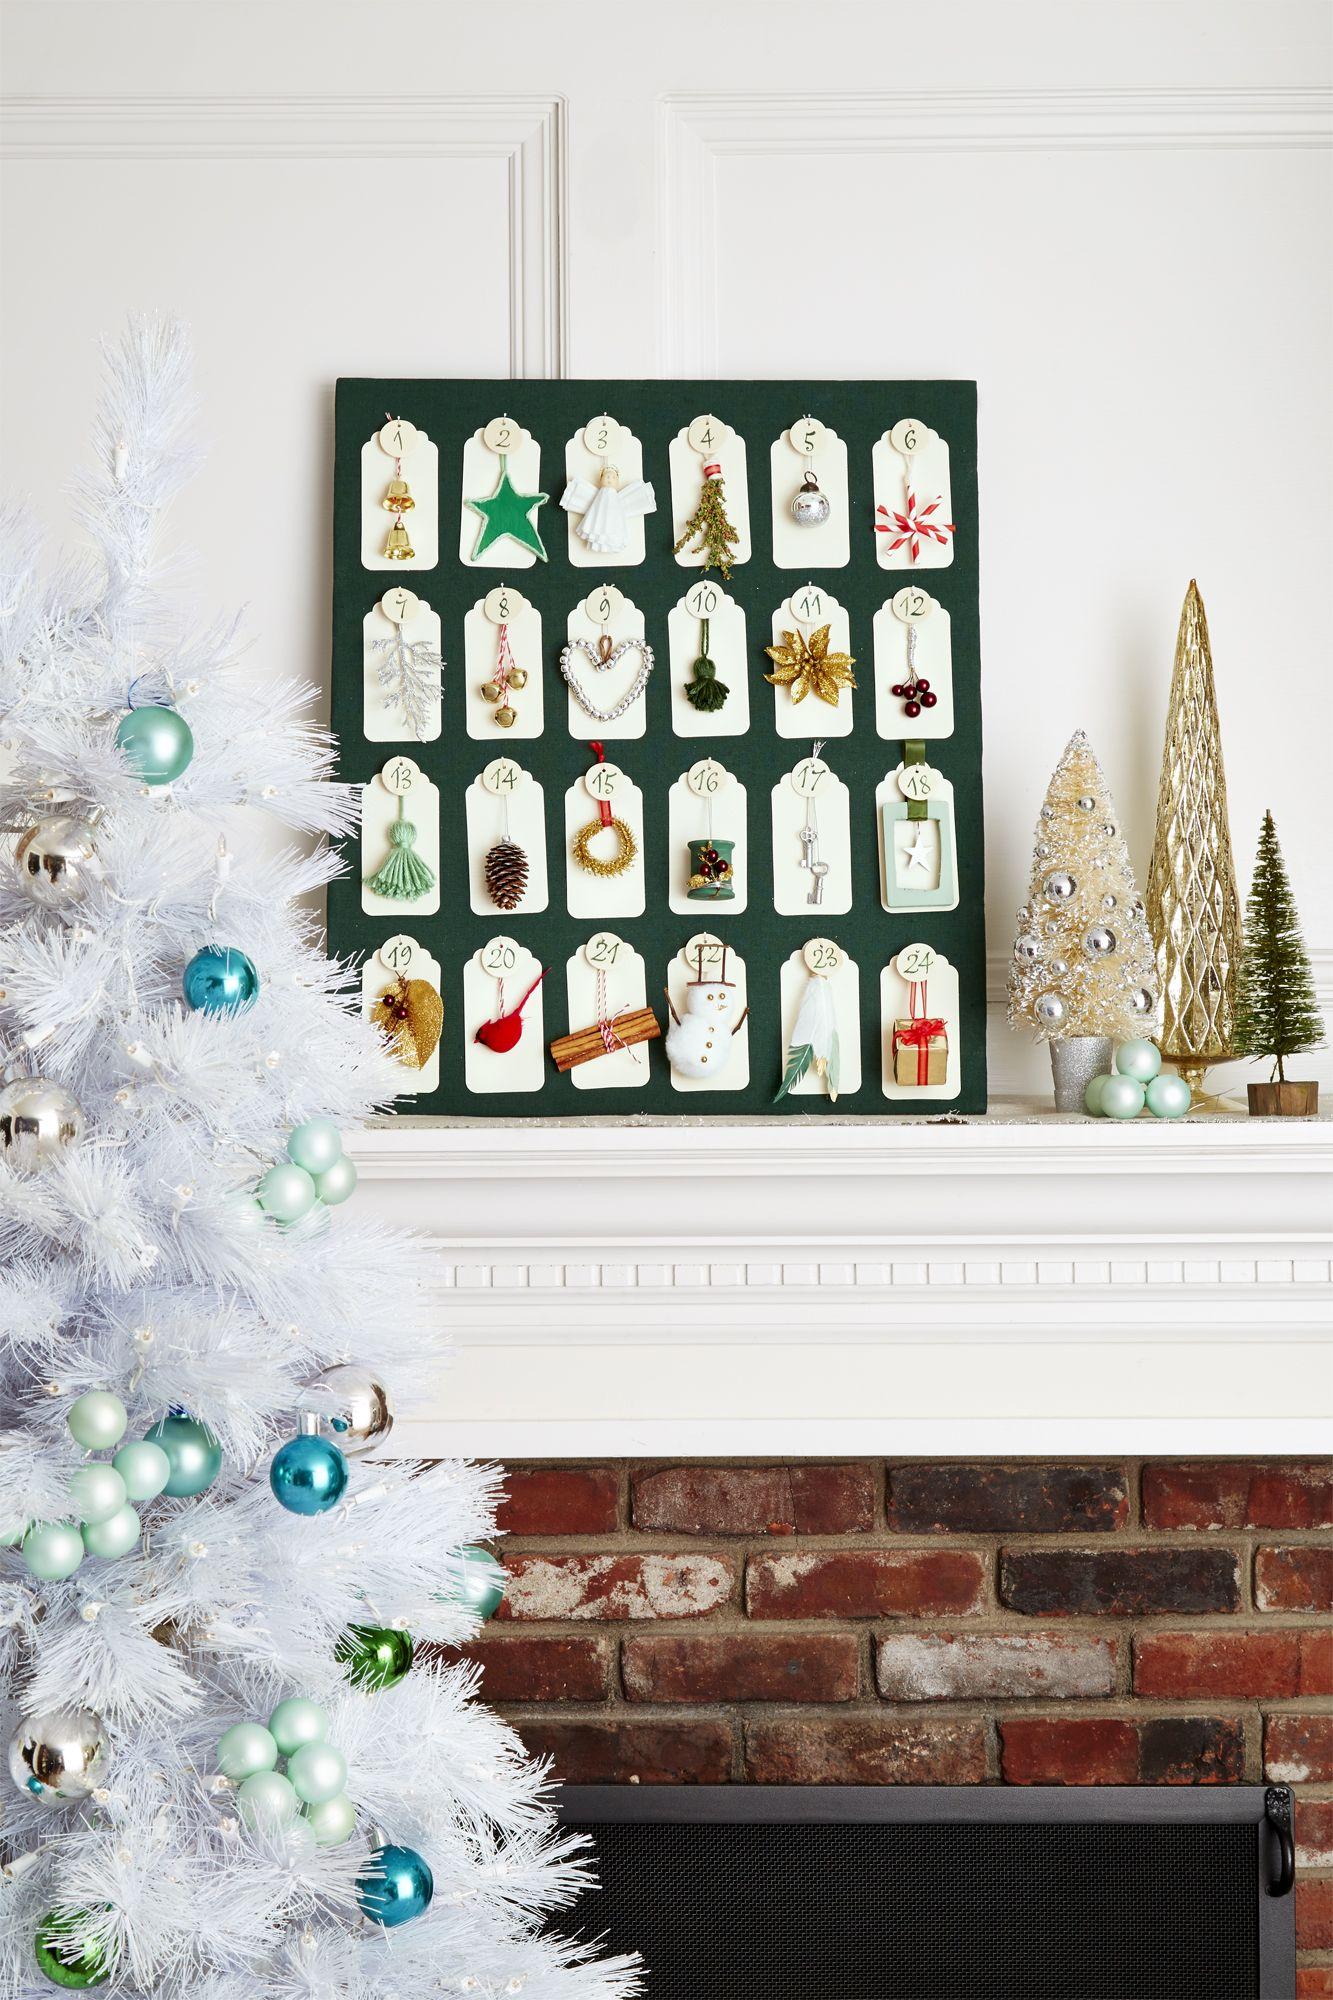 DIY Christmas Wall Decor with Countdown Calendar Ideas